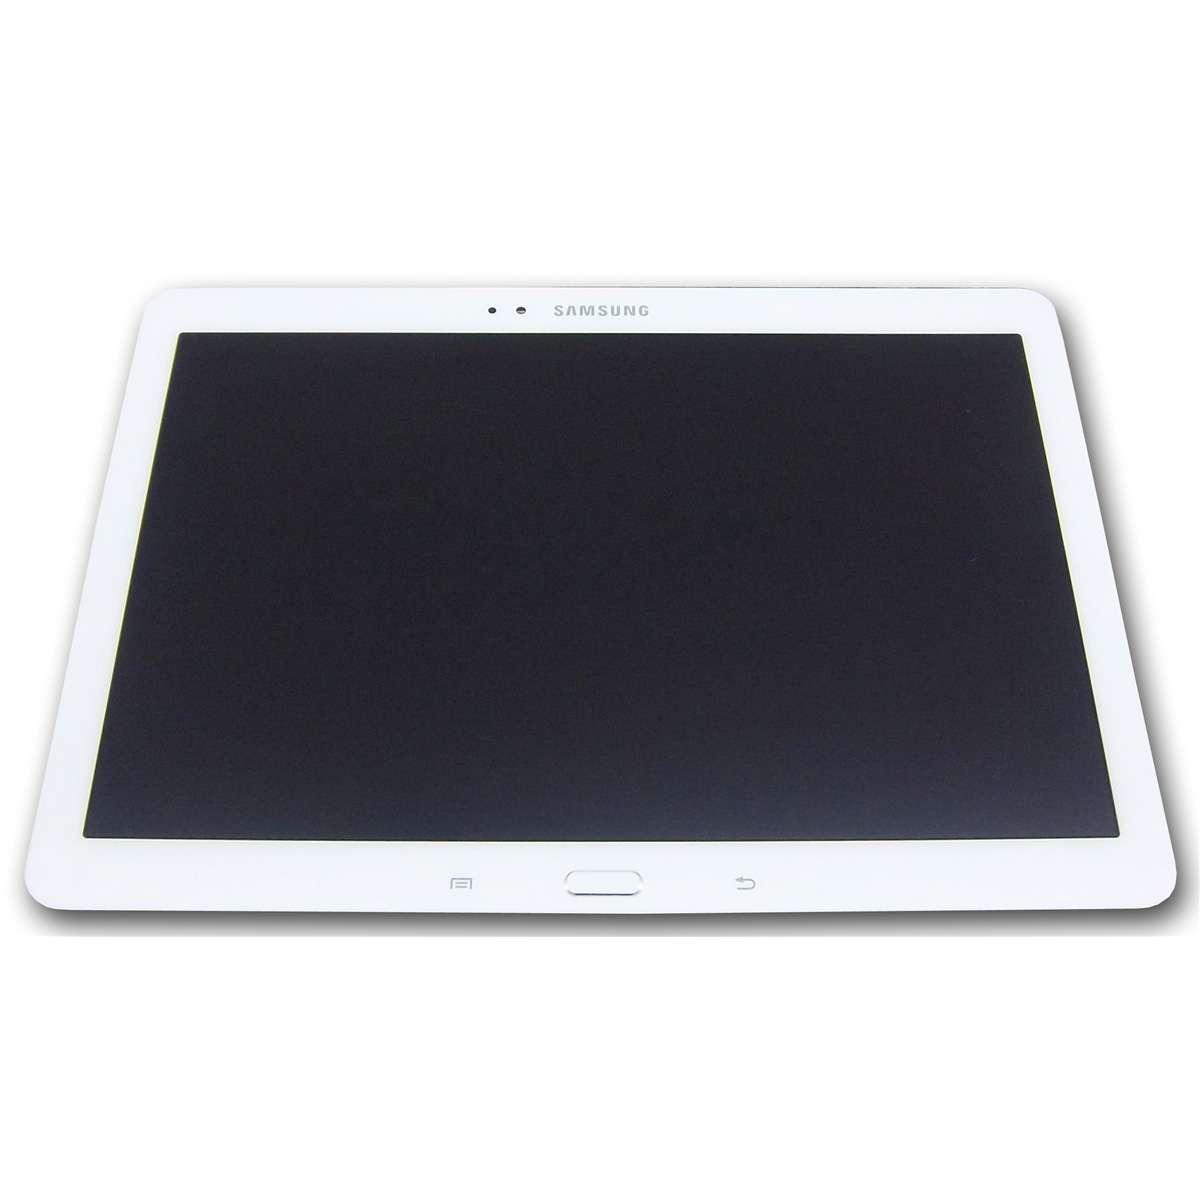 Ansamblu LCD Display Touchscreen Samsung P600 Galaxy Note 10.1 2014 WiFi Alb imagine powerlaptop.ro 2021